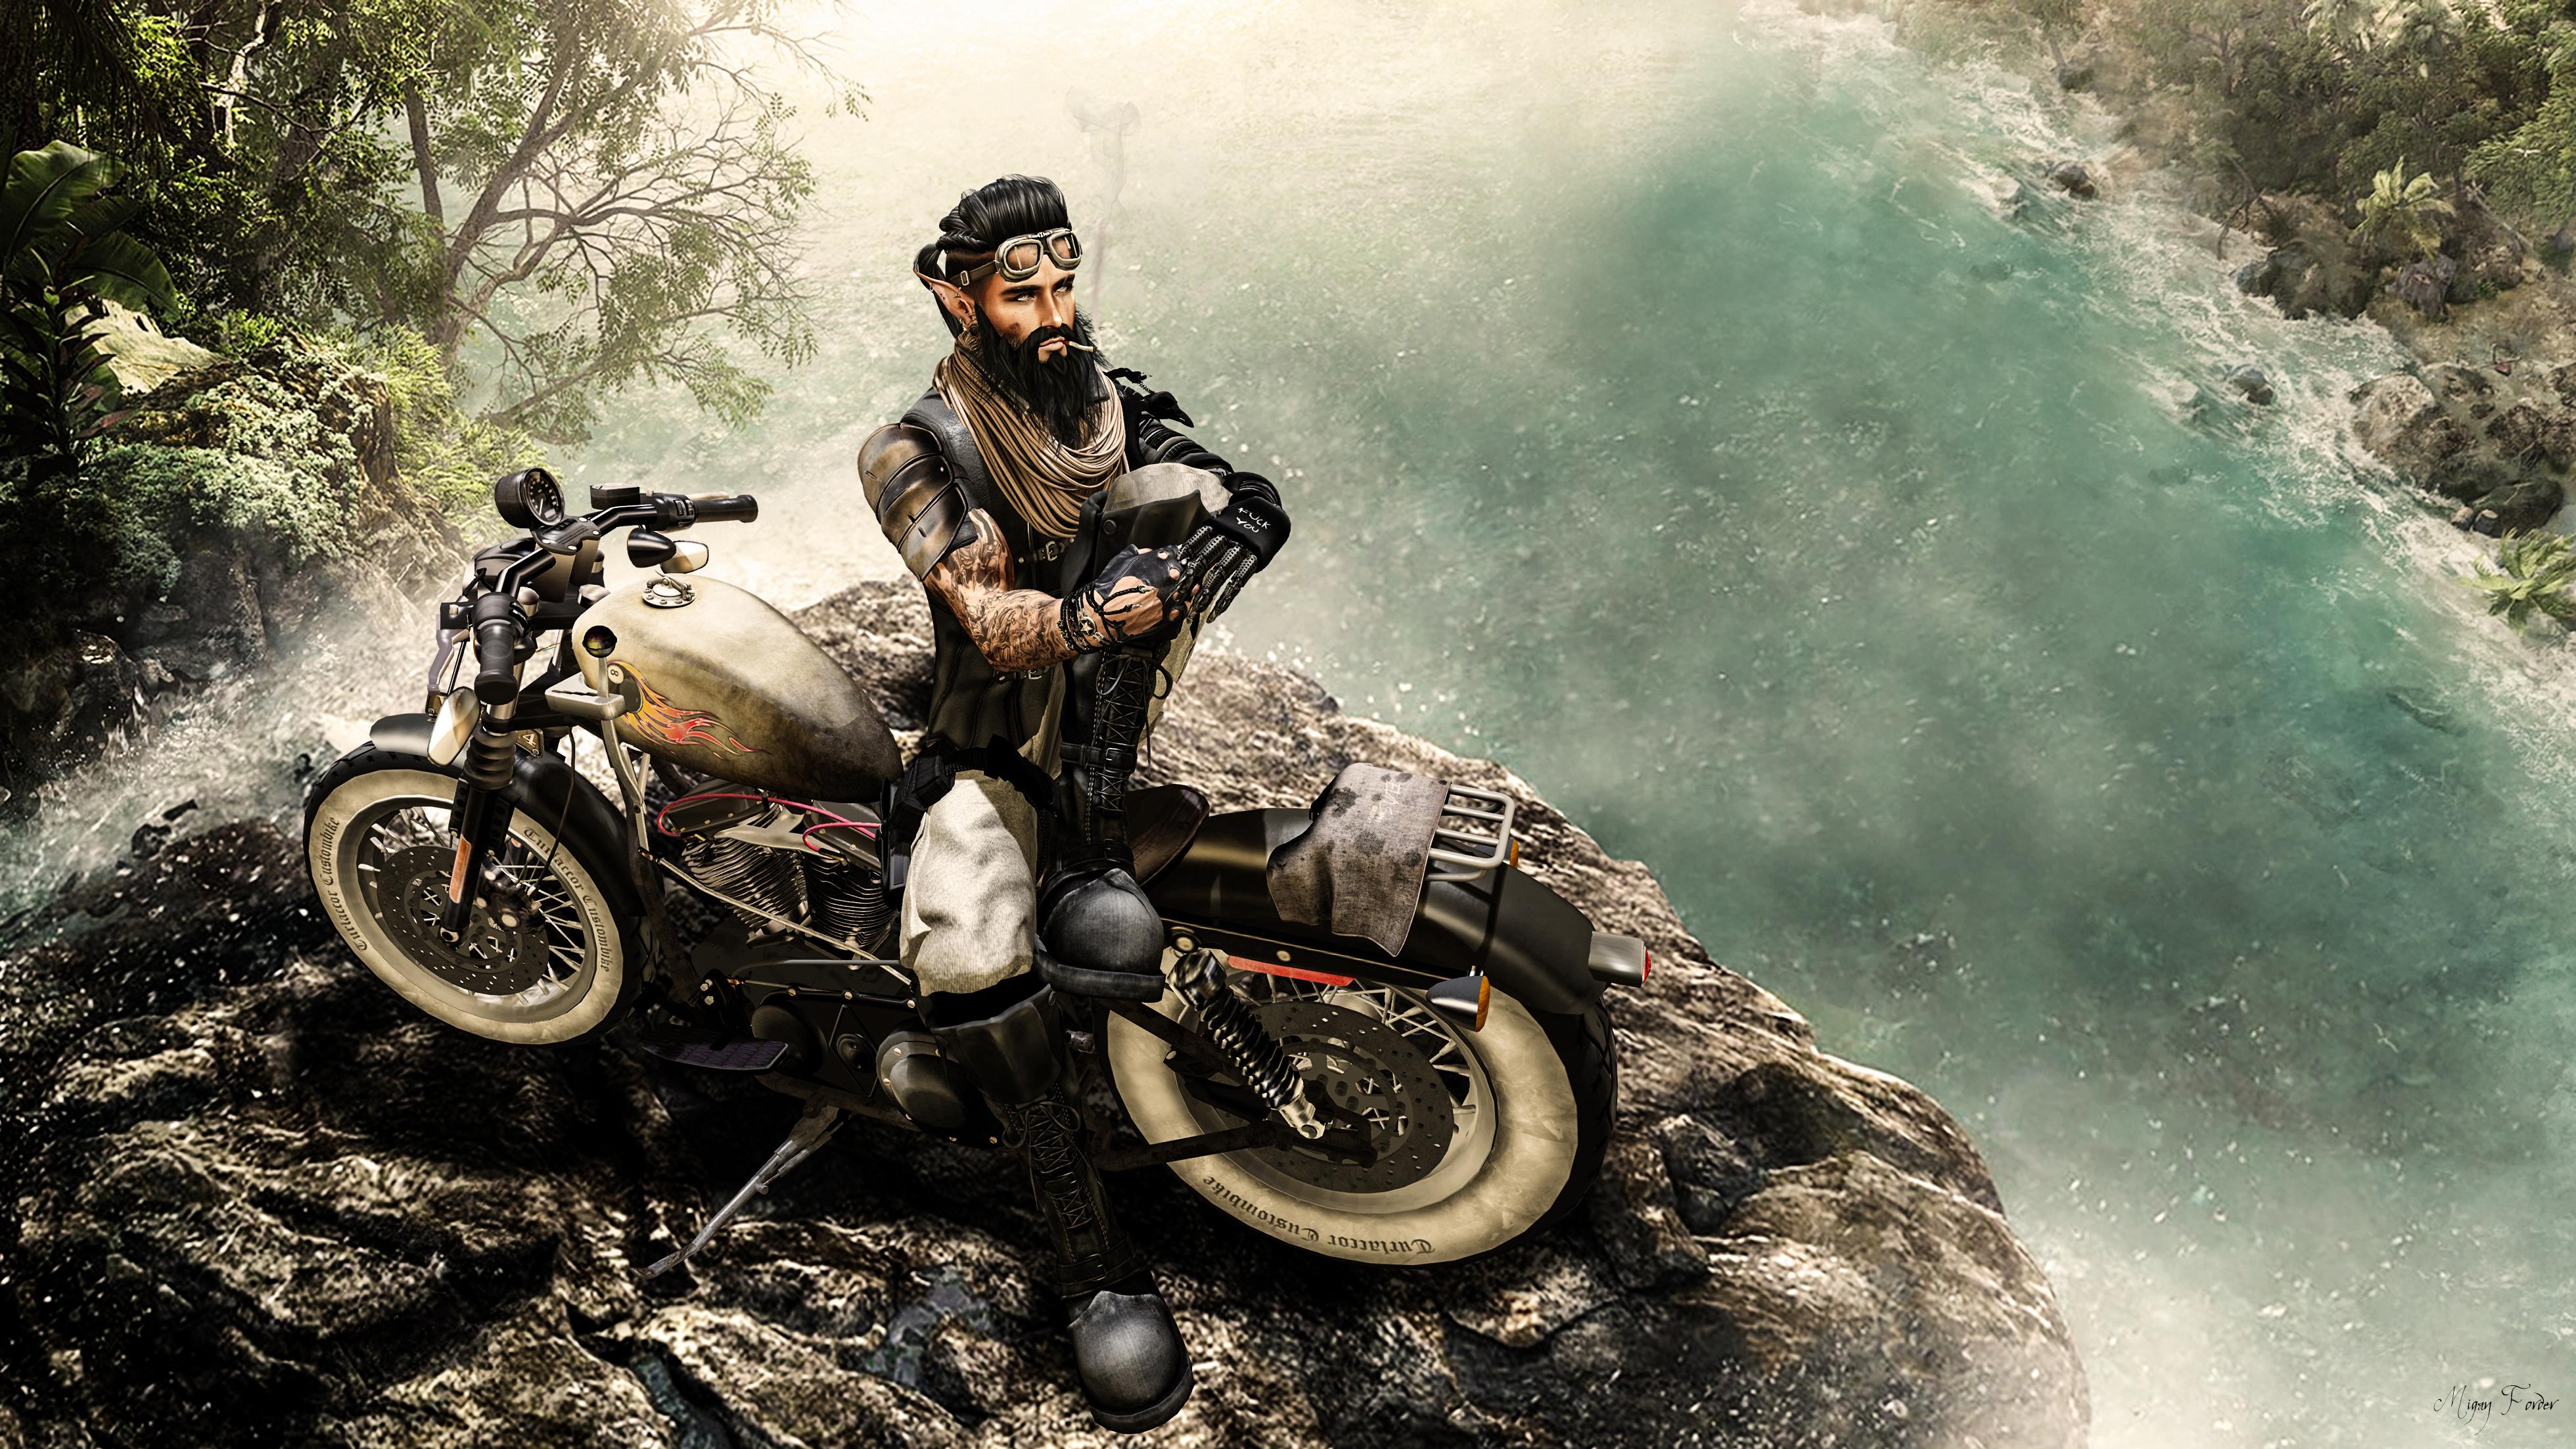 World Life Male Bike Chopper Iron Cross Motorcycles Bikes Harley VirTual Moto Motorcycle Second Bici Biker